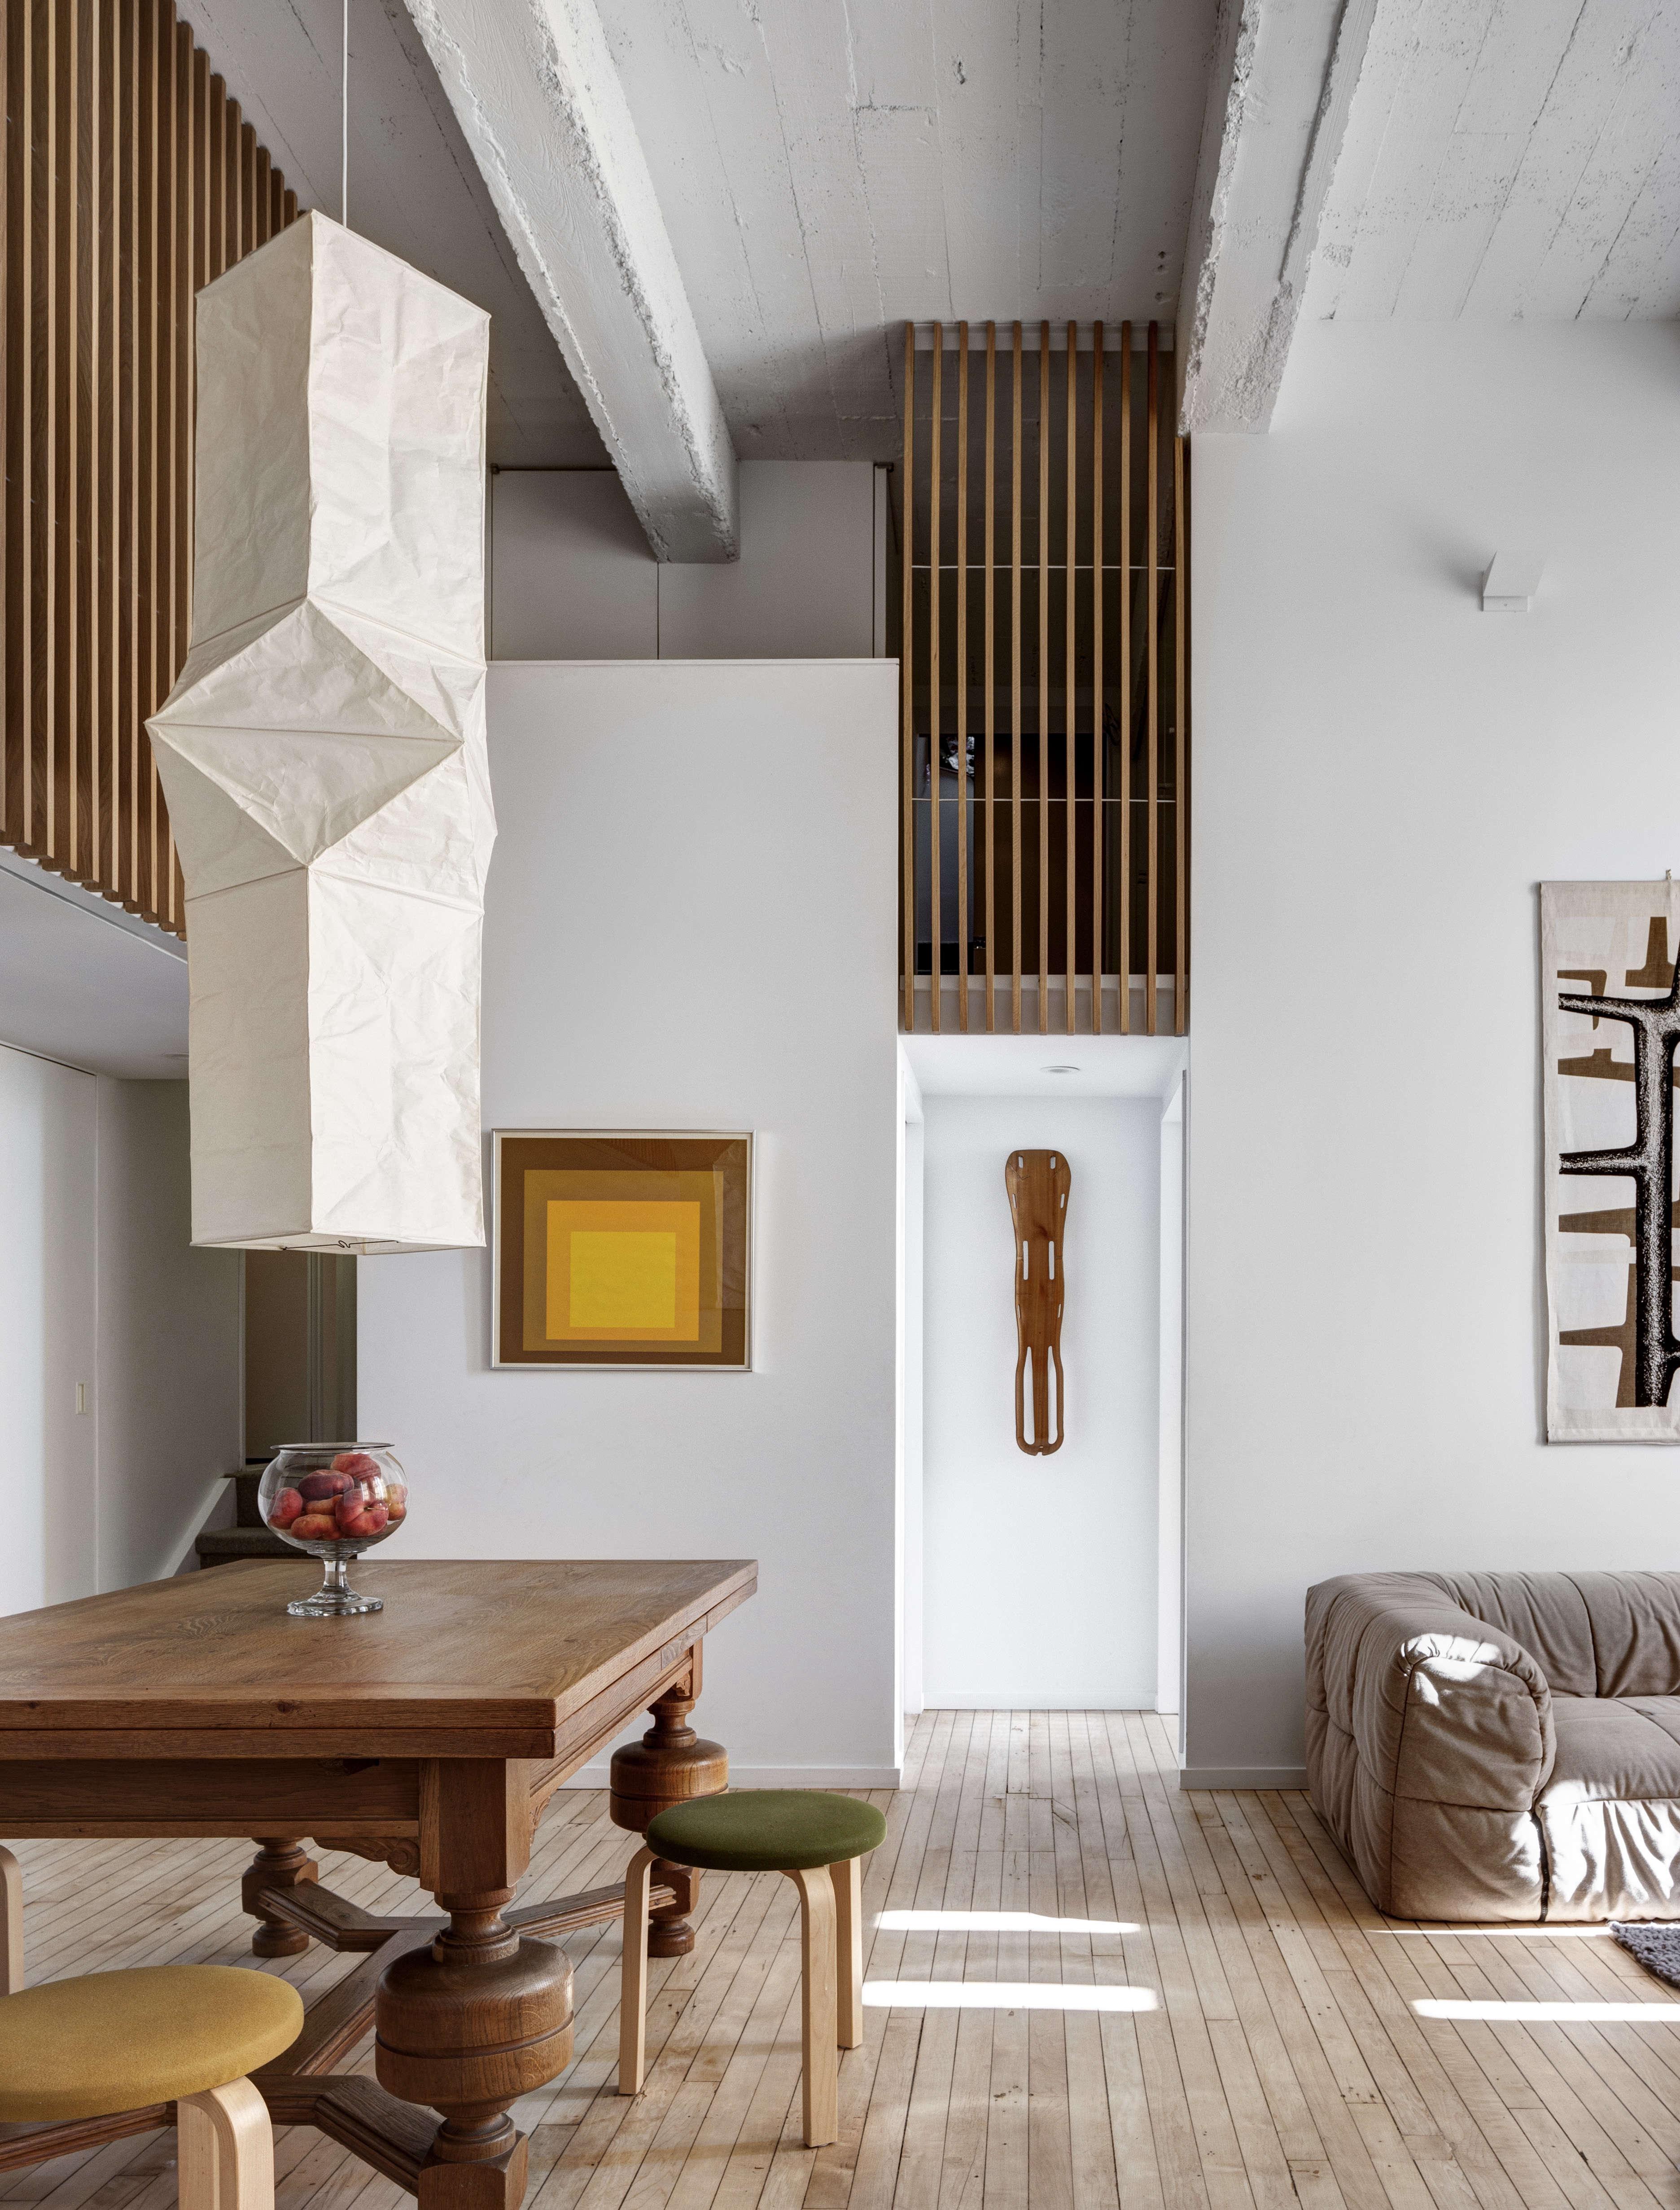 Jennifer Hanlin Cobble Hill Apartment Living Room, Photo by Bruce Buck